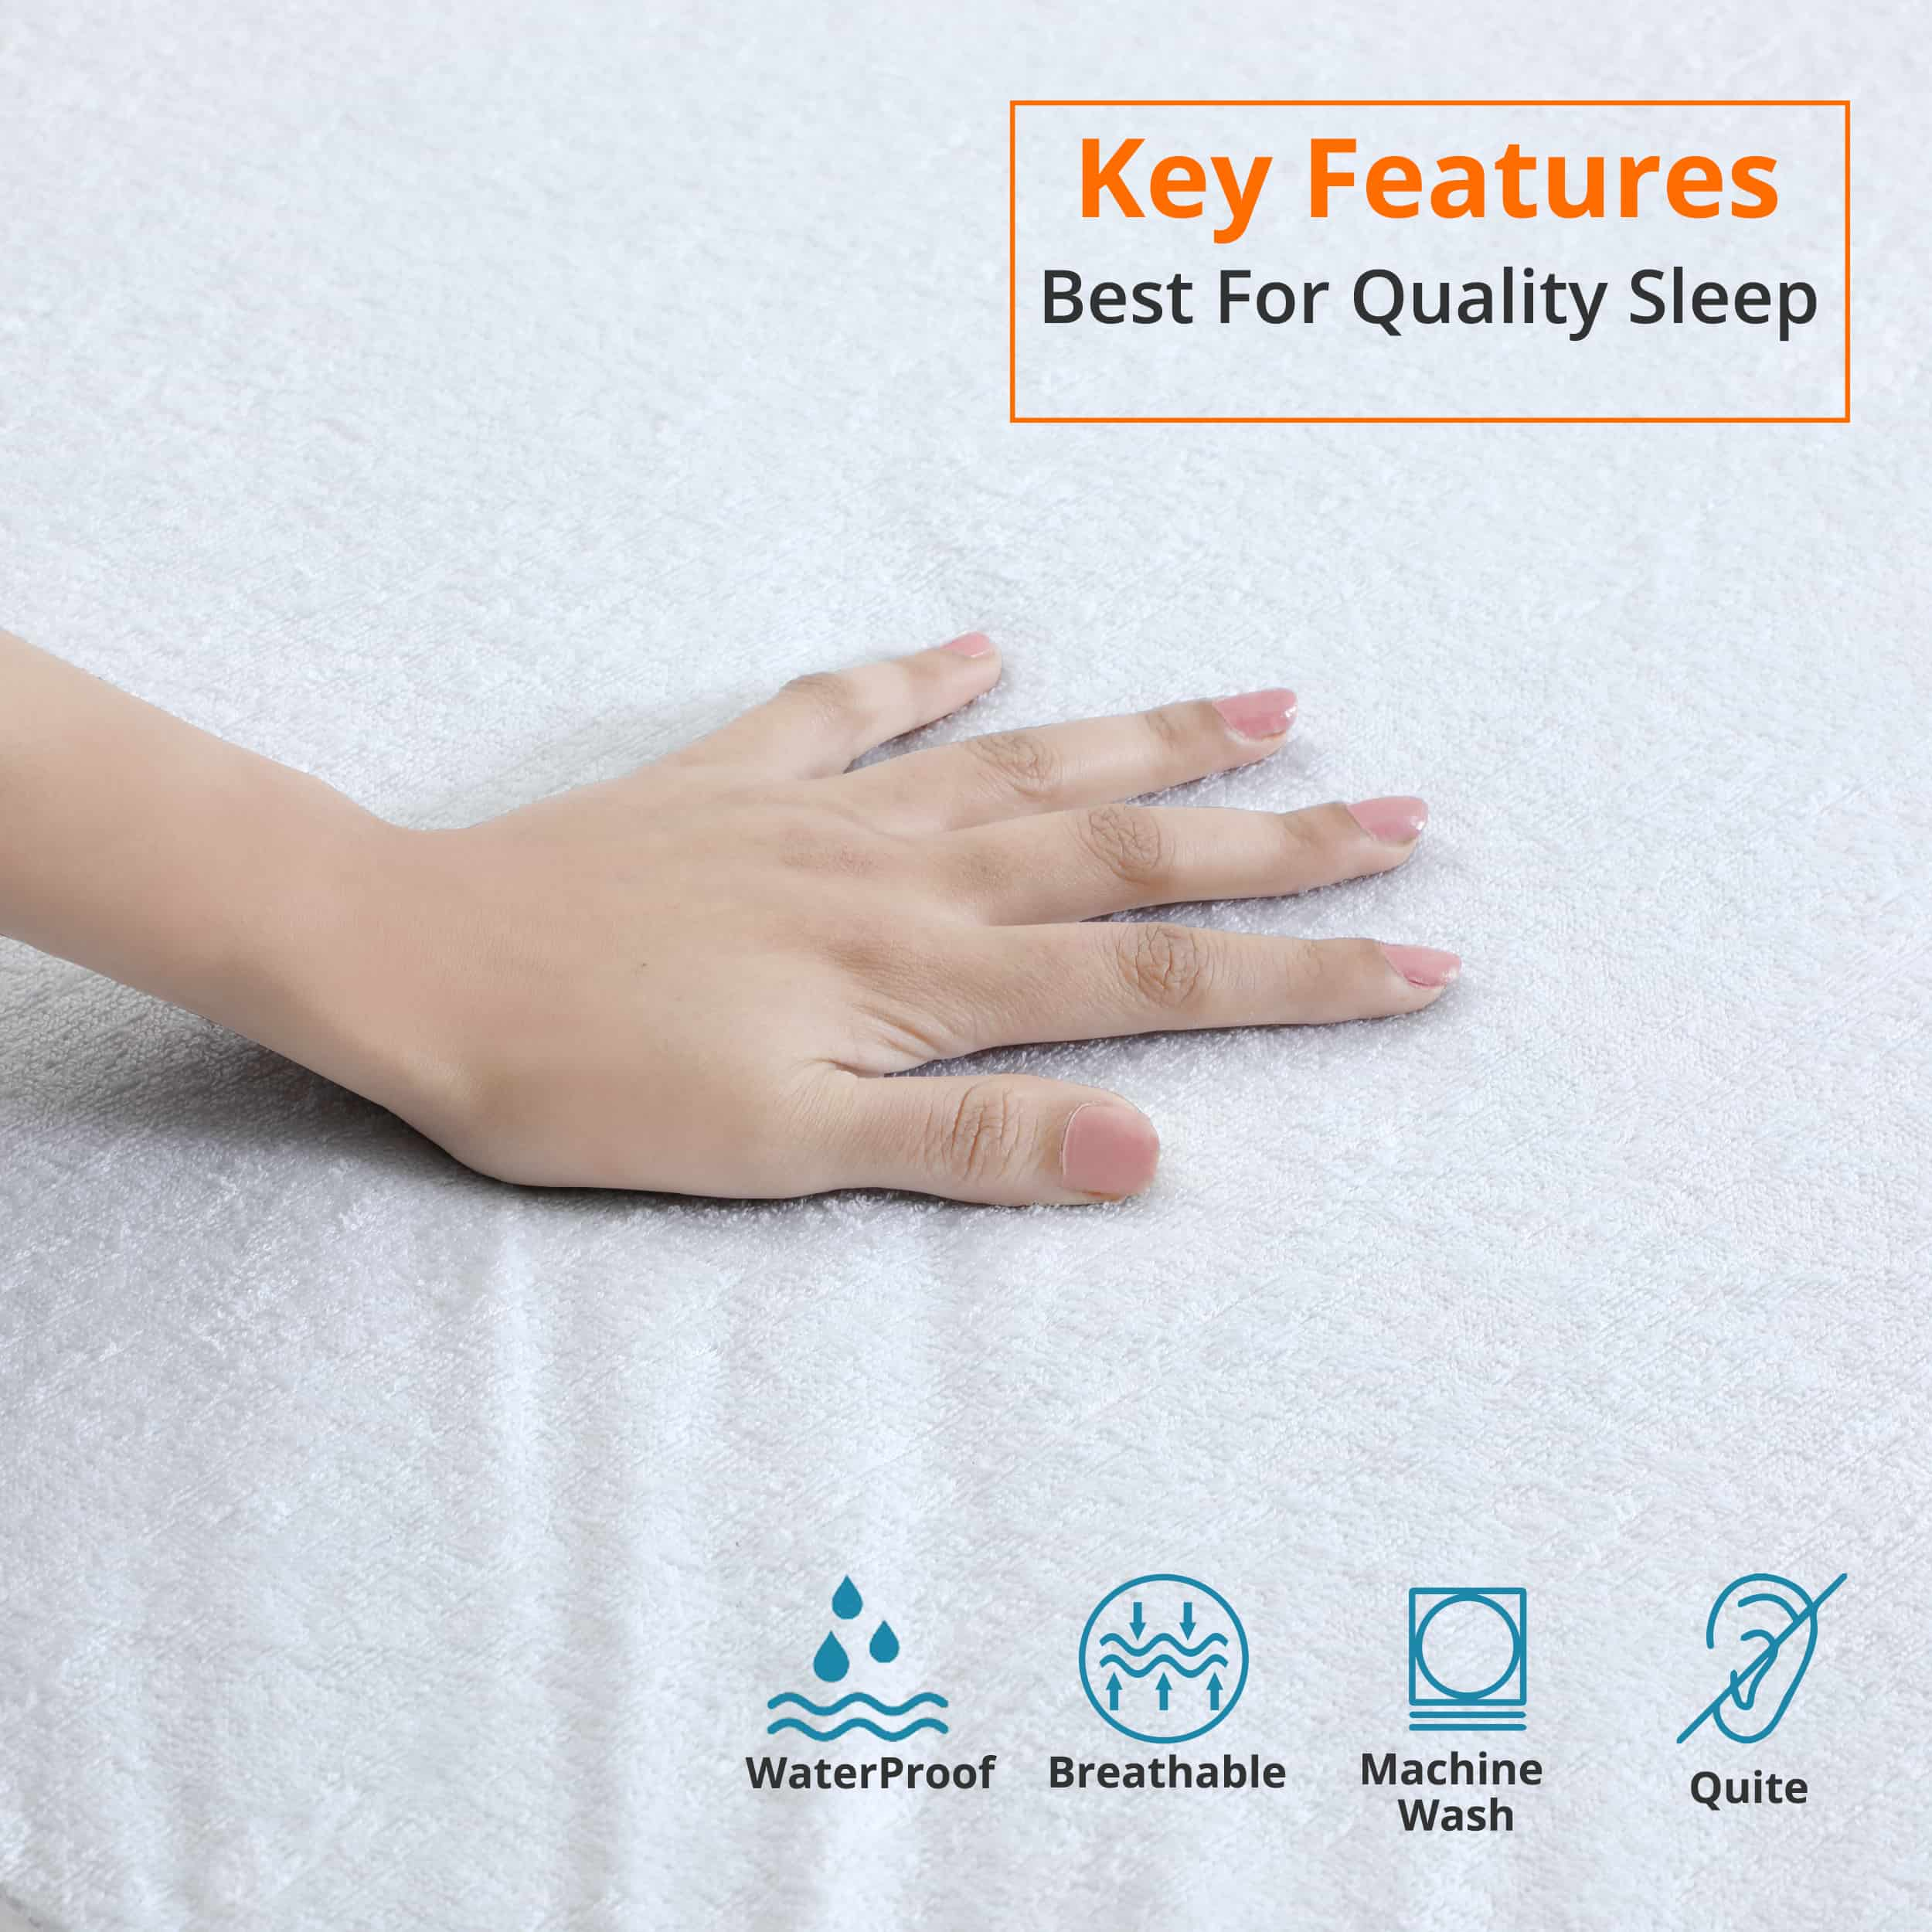 mattress-protector-double-min.jpg?time=1635056428